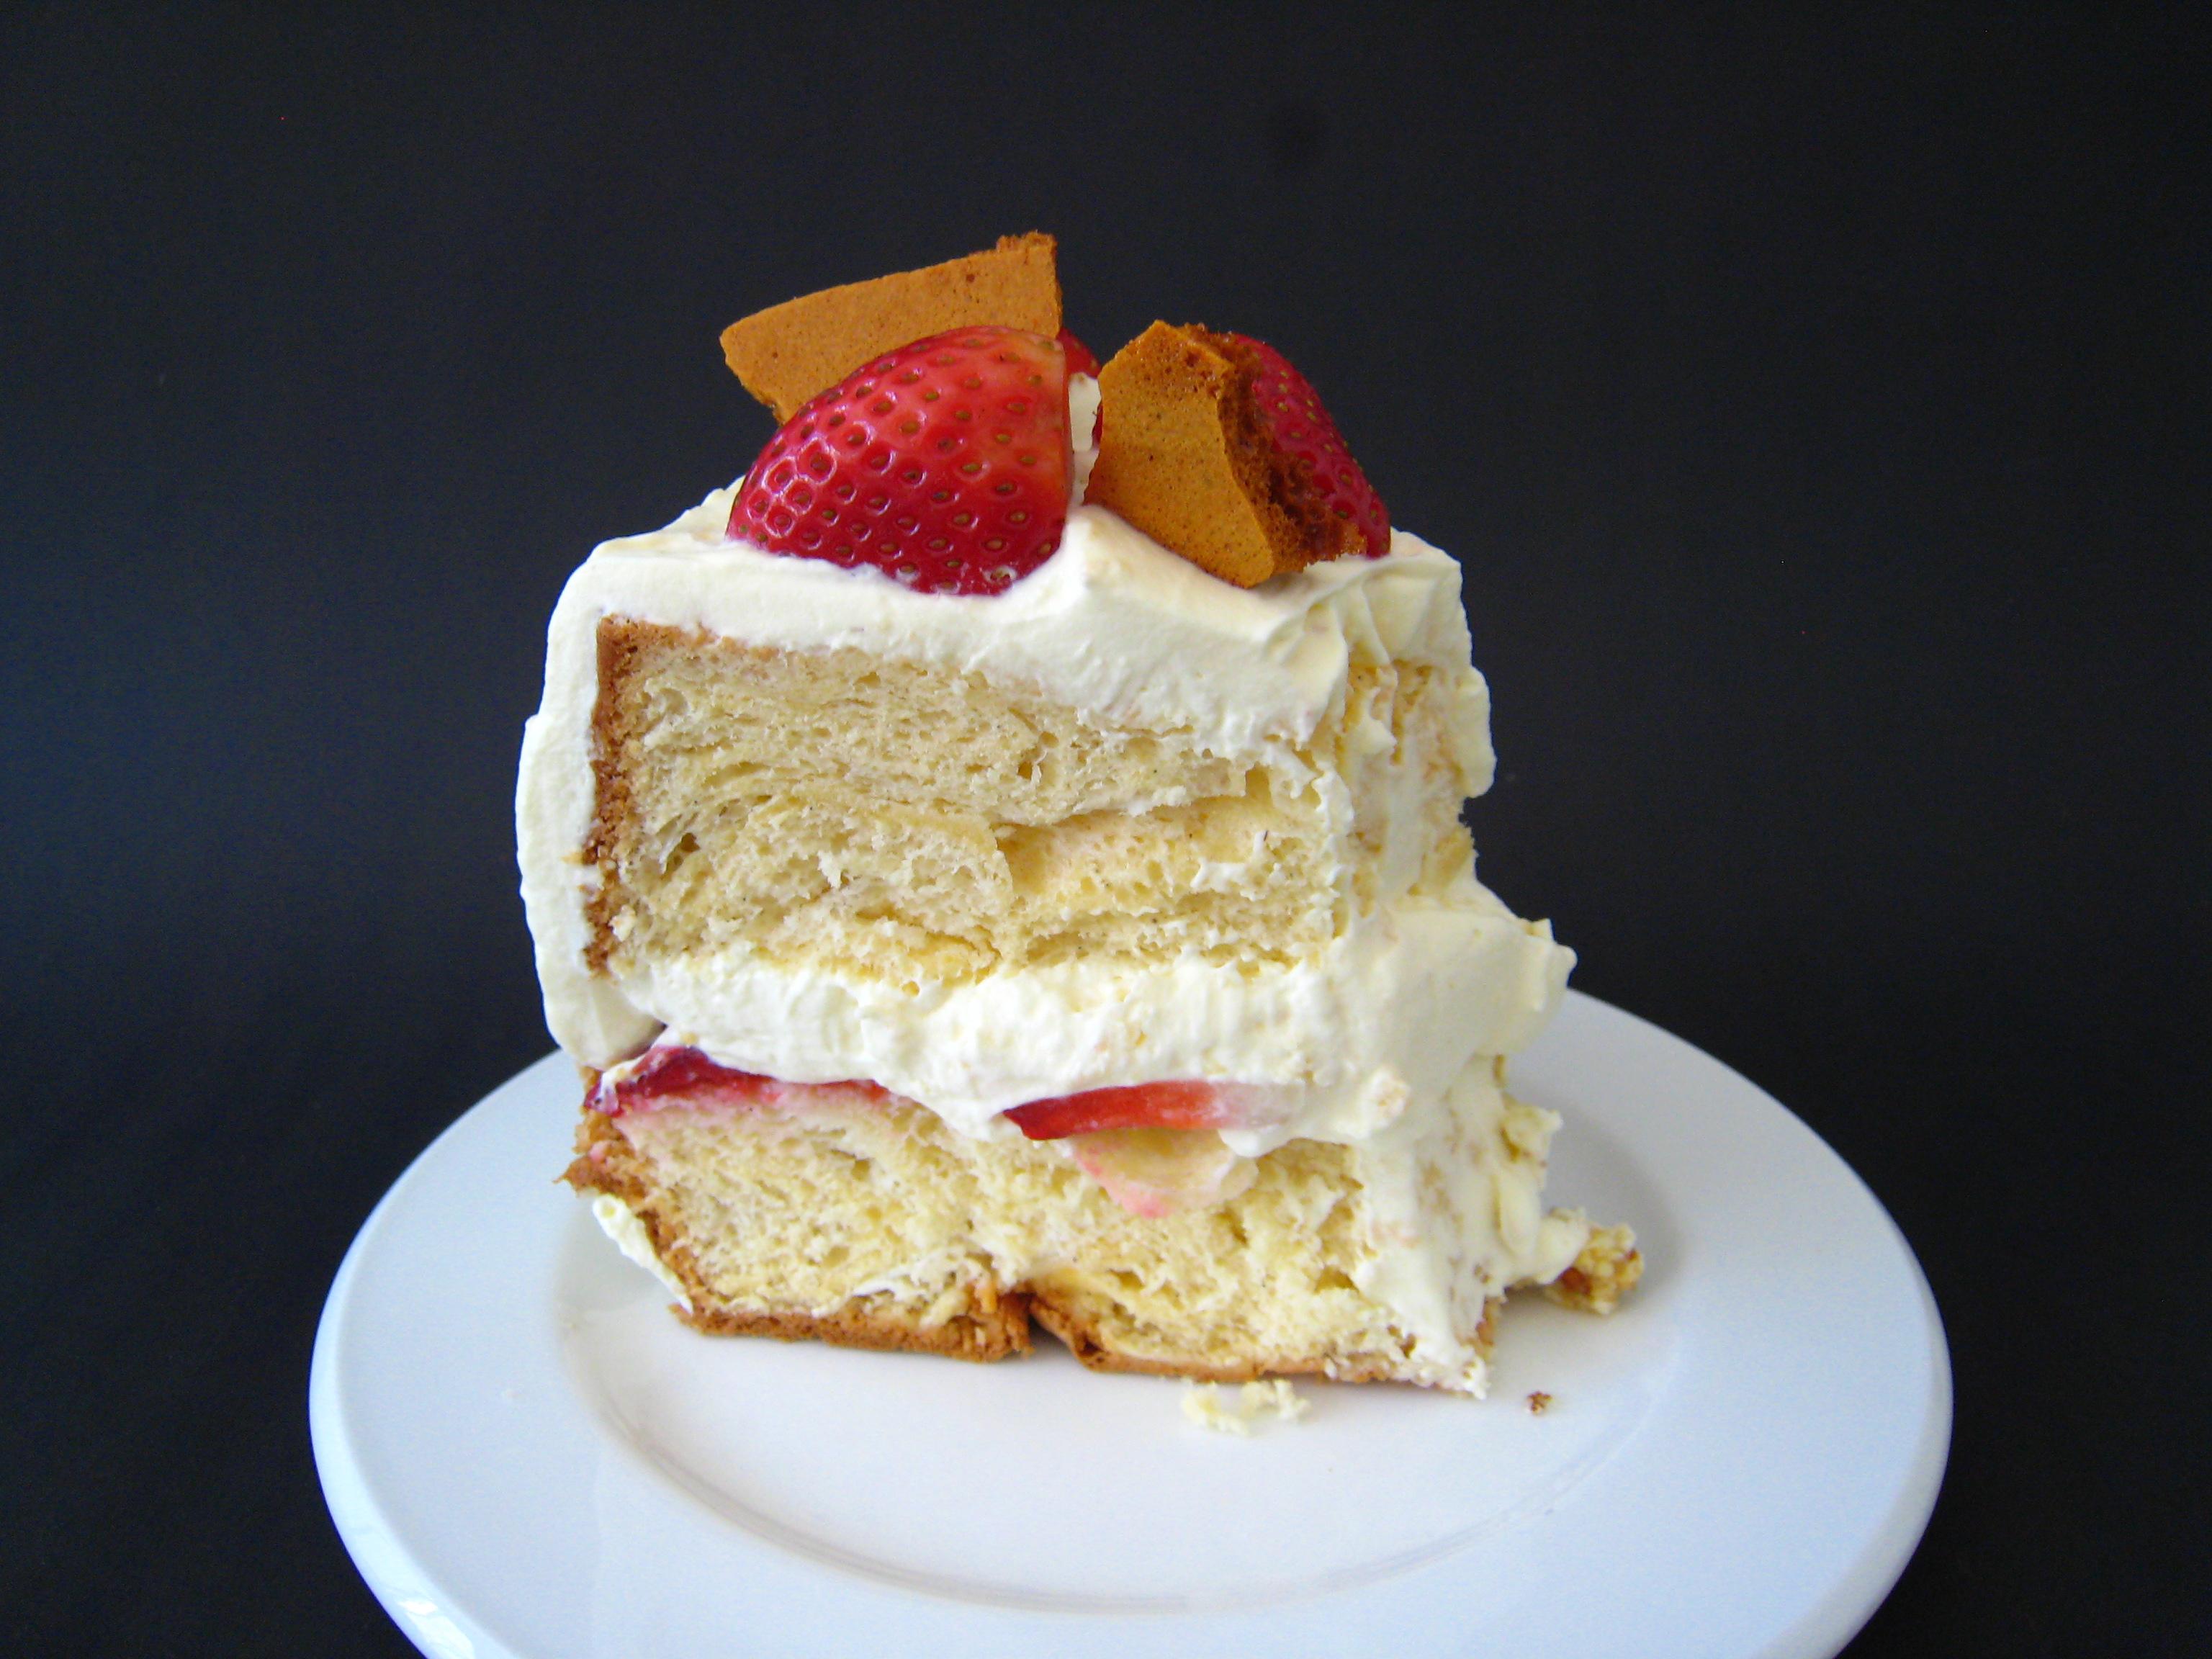 A slice of brittle torte